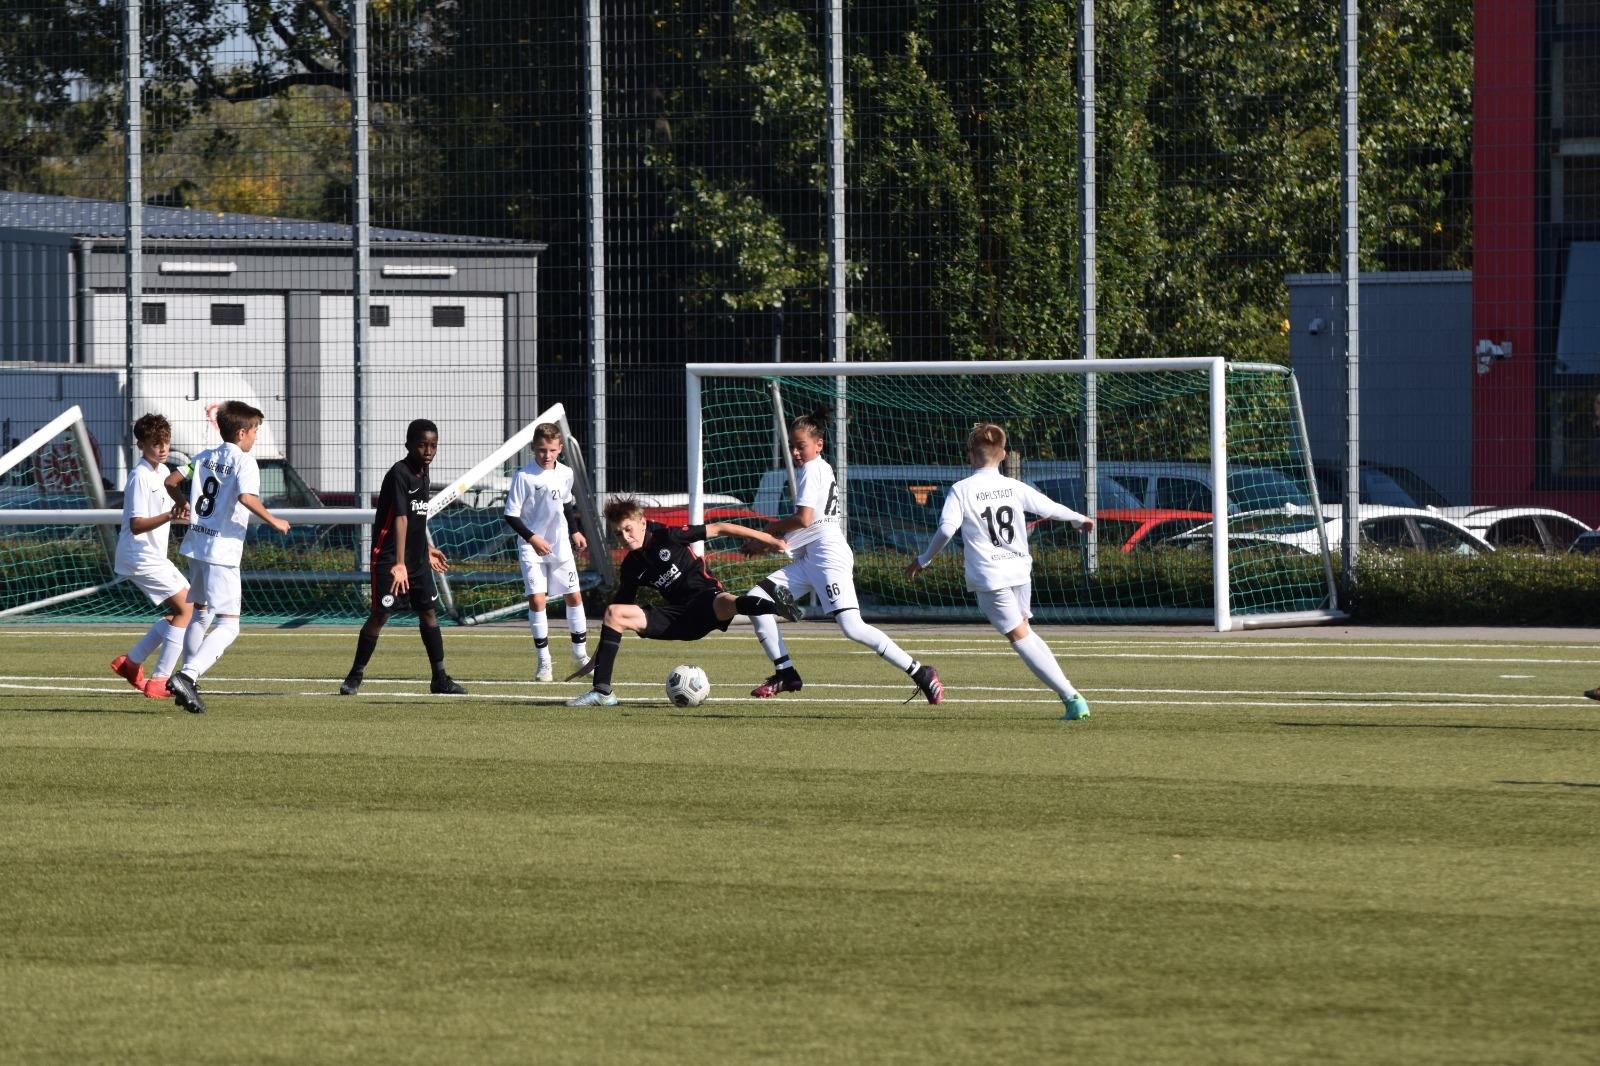 Eintracht Frankfurt - U13